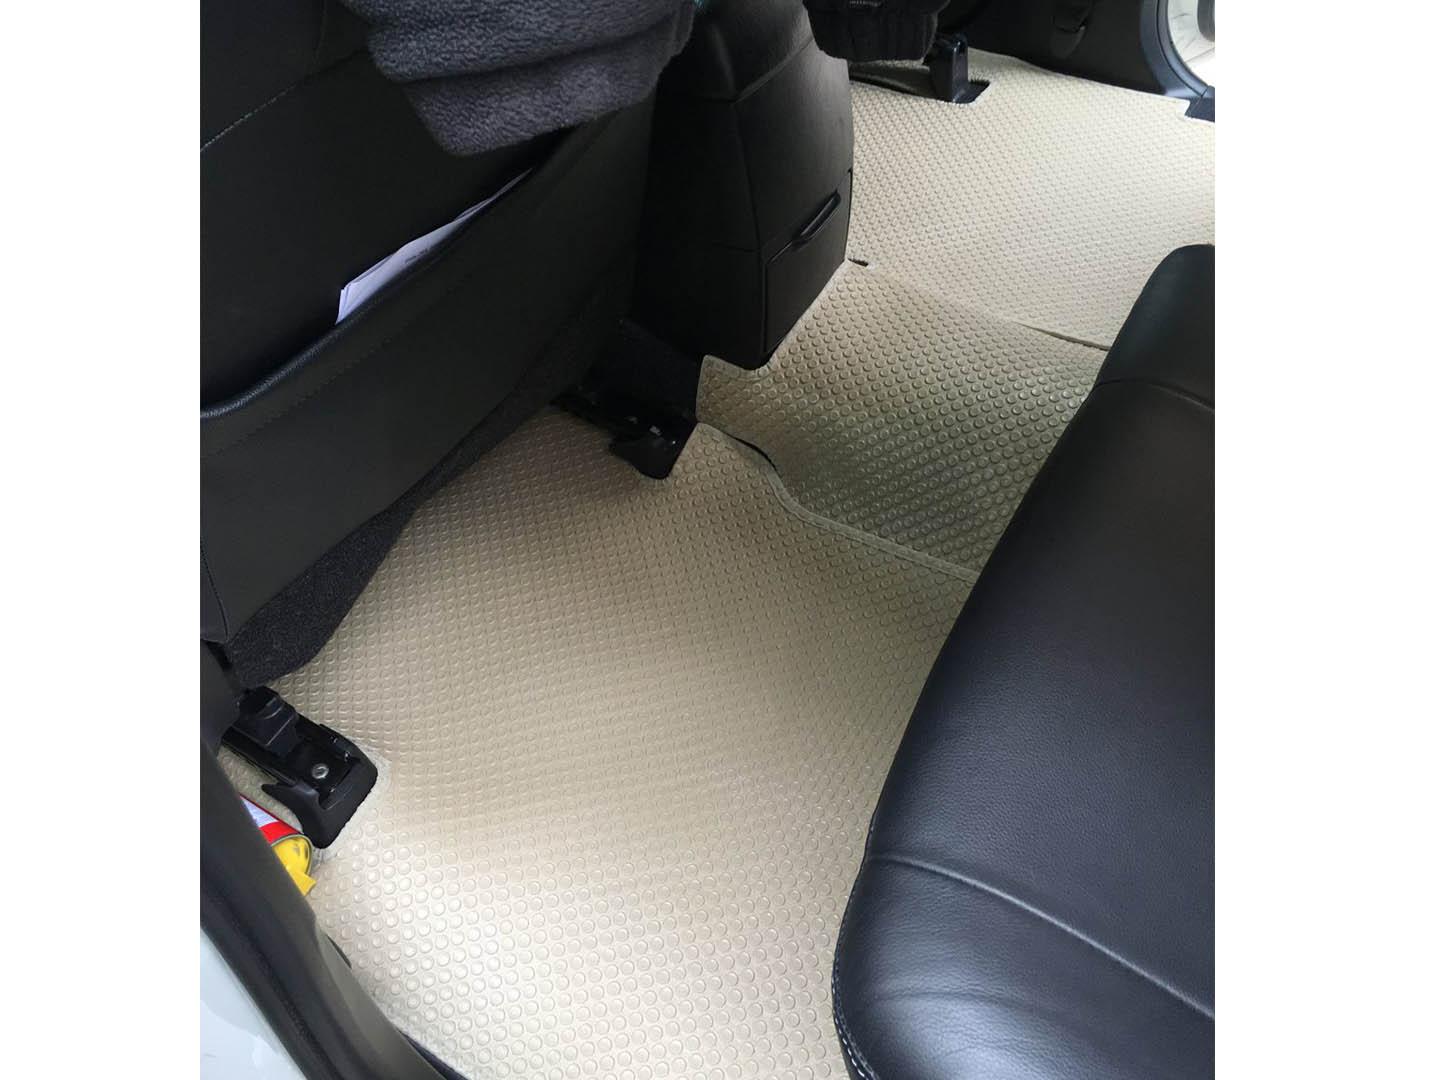 Thảm lót sàn Toyota Fortuner 2014